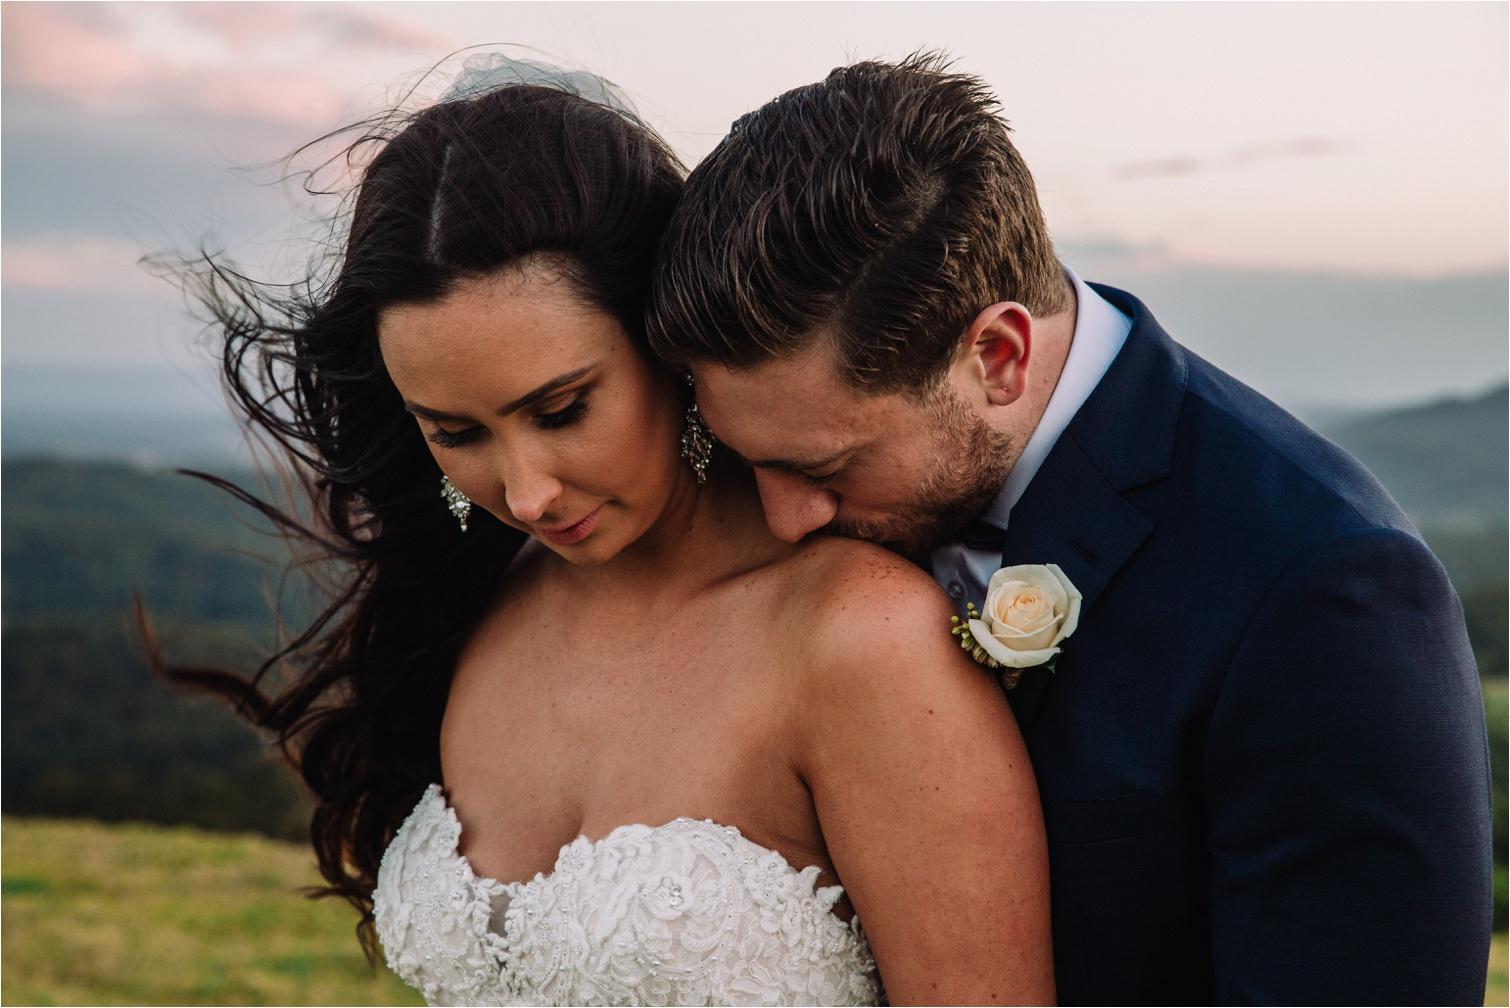 Maleny Manor Wedding Photography - Gold Coast Wedding Photographer_0053.jpg